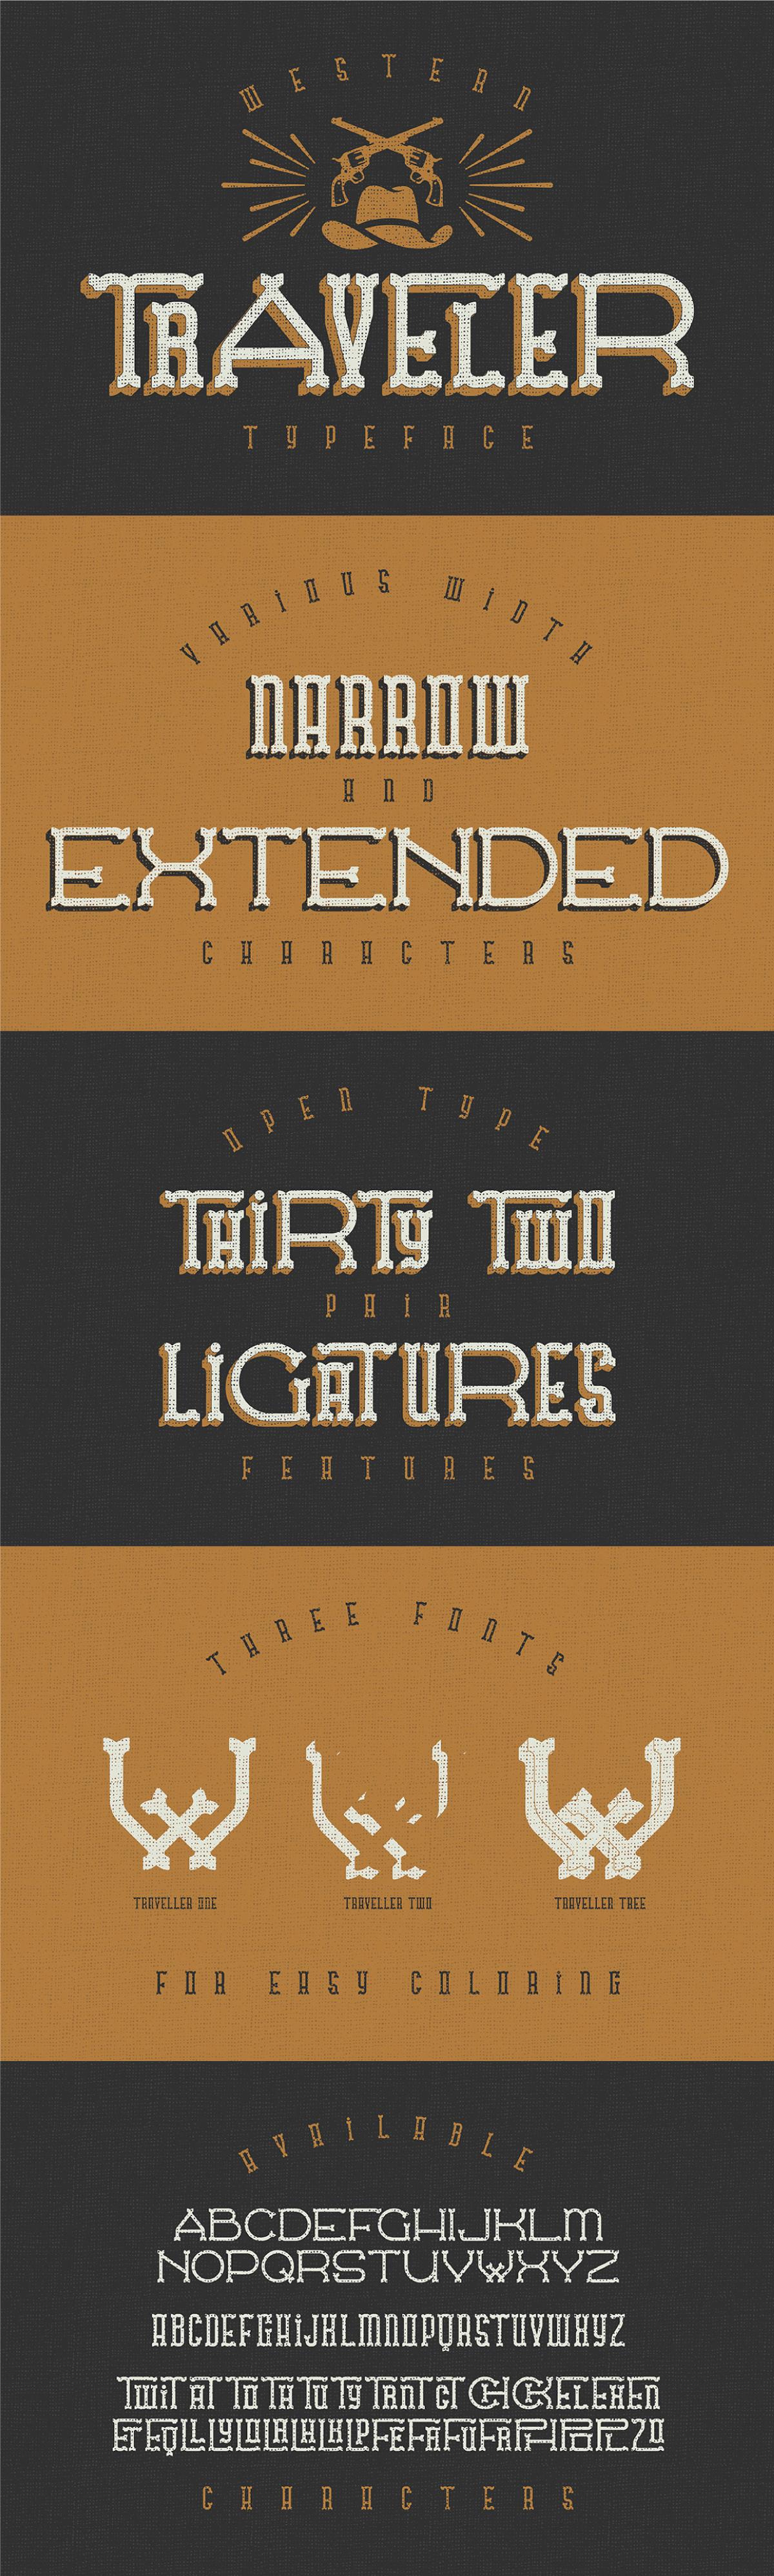 traveller free western typeface